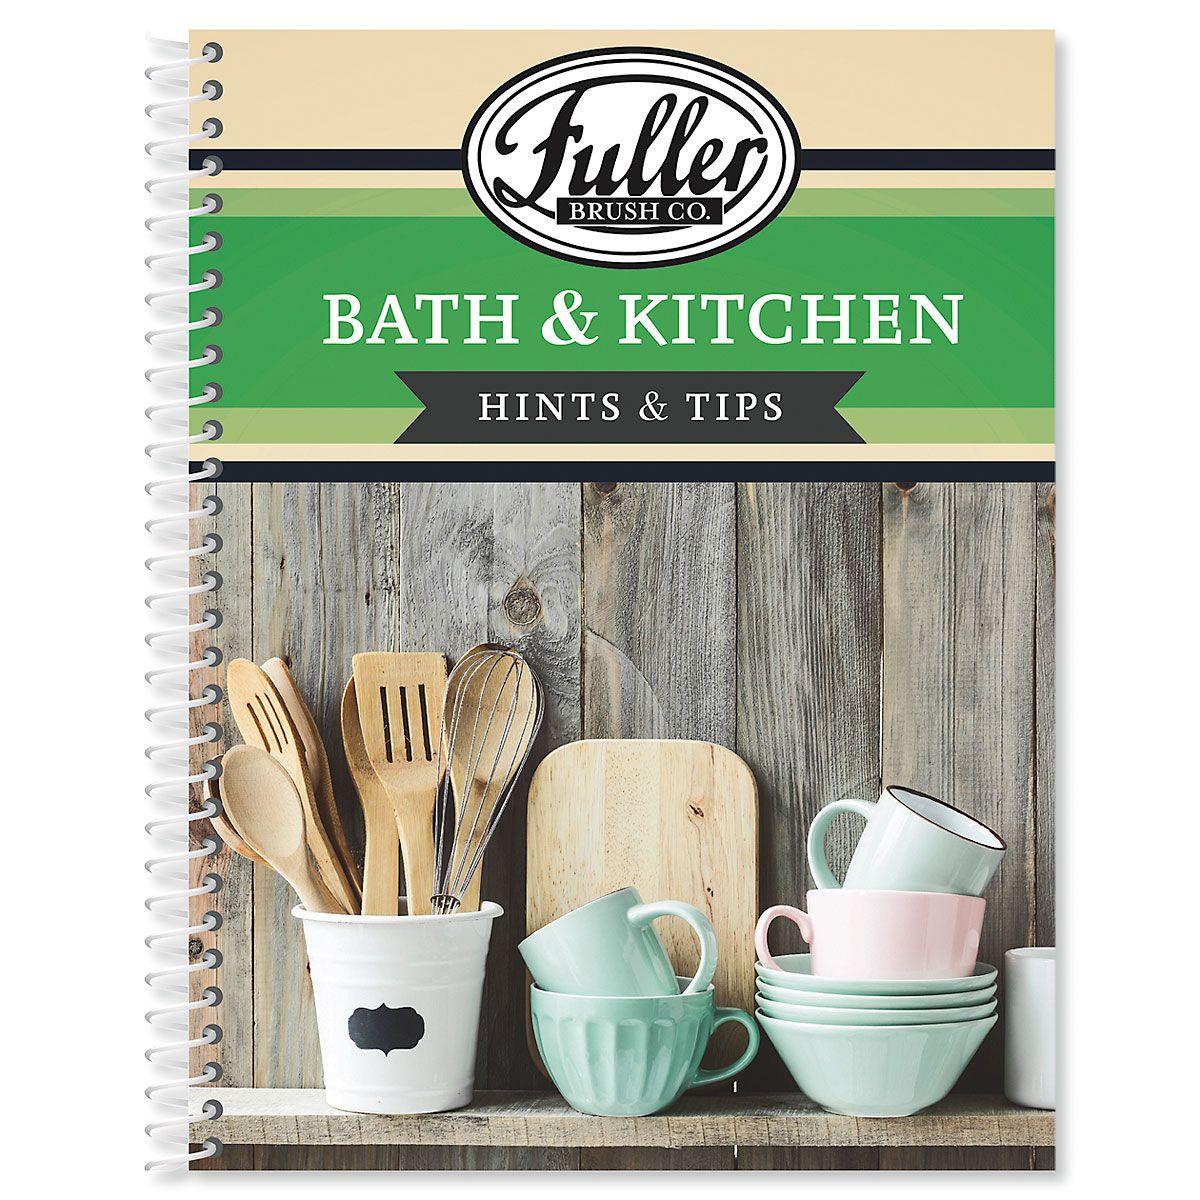 Fuller Bath & Kitchen Hints & Tips